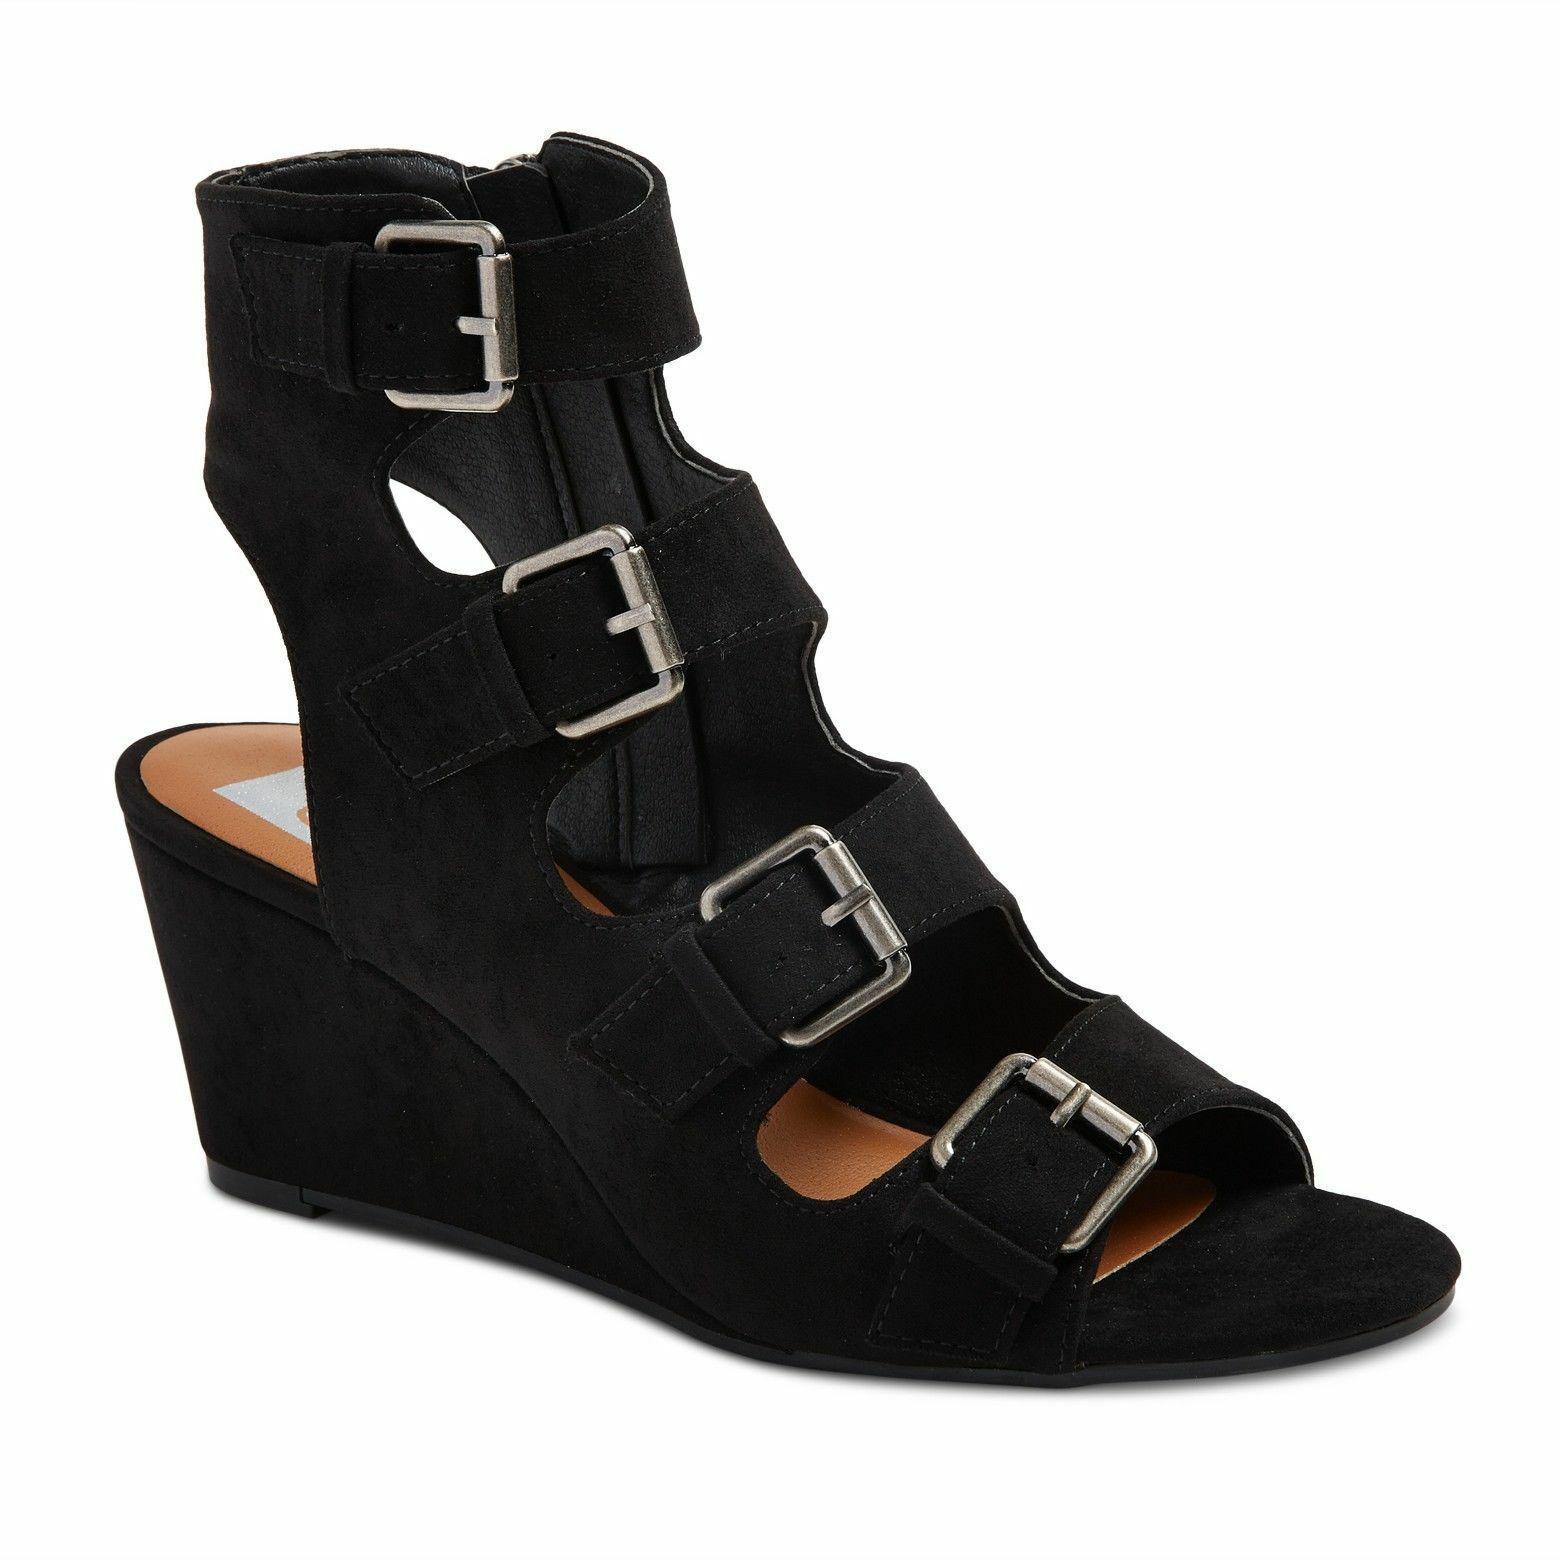 New DV Dolce Vita Black LeeAnn Buckle Wedge Gladiator Open Toe Sandals